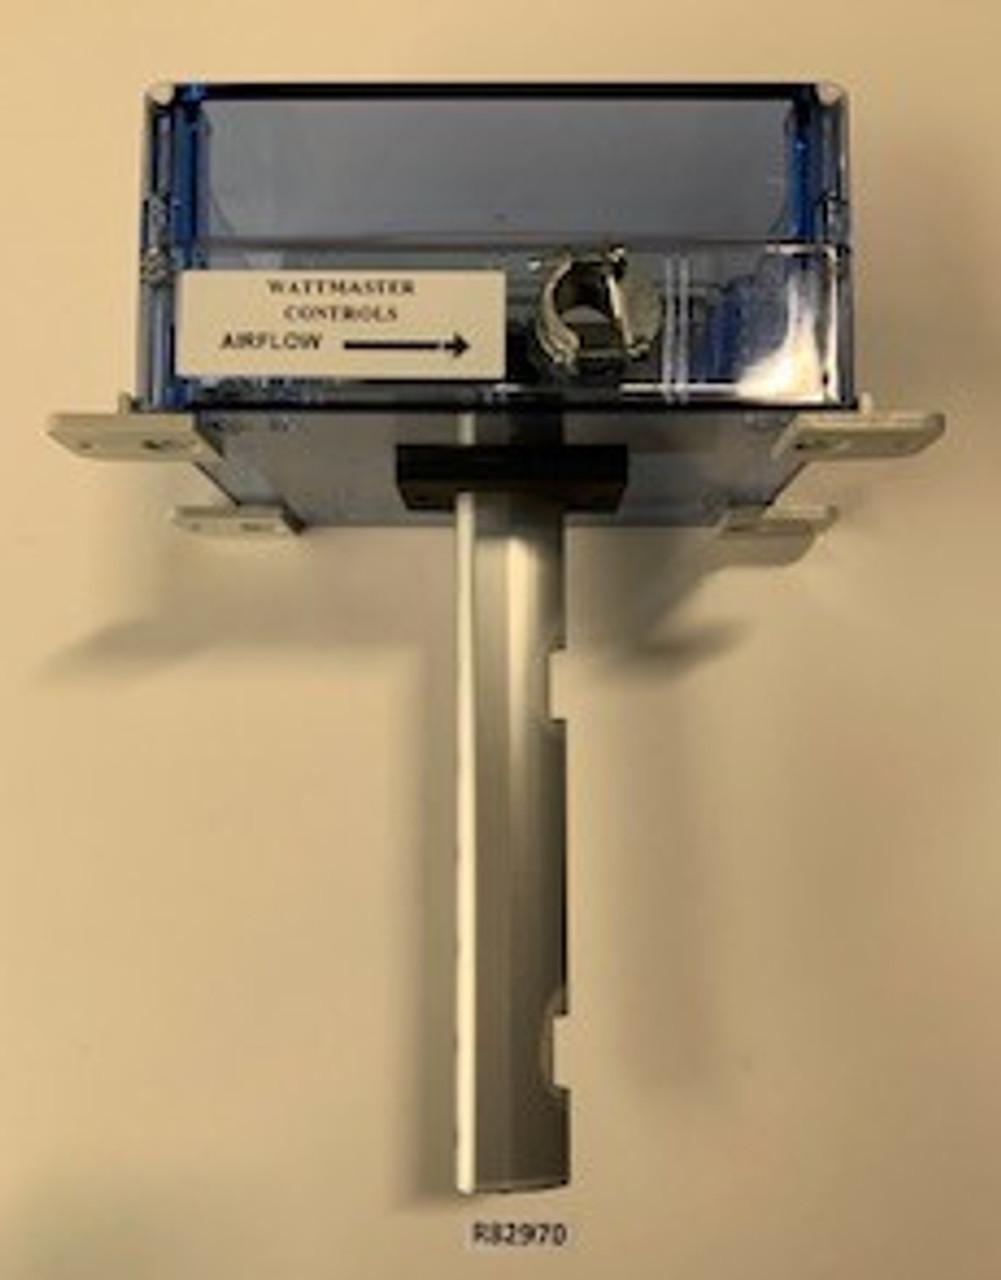 Sensor, CO2 Duct, Dig Comm VCMX, Aaon, R82970